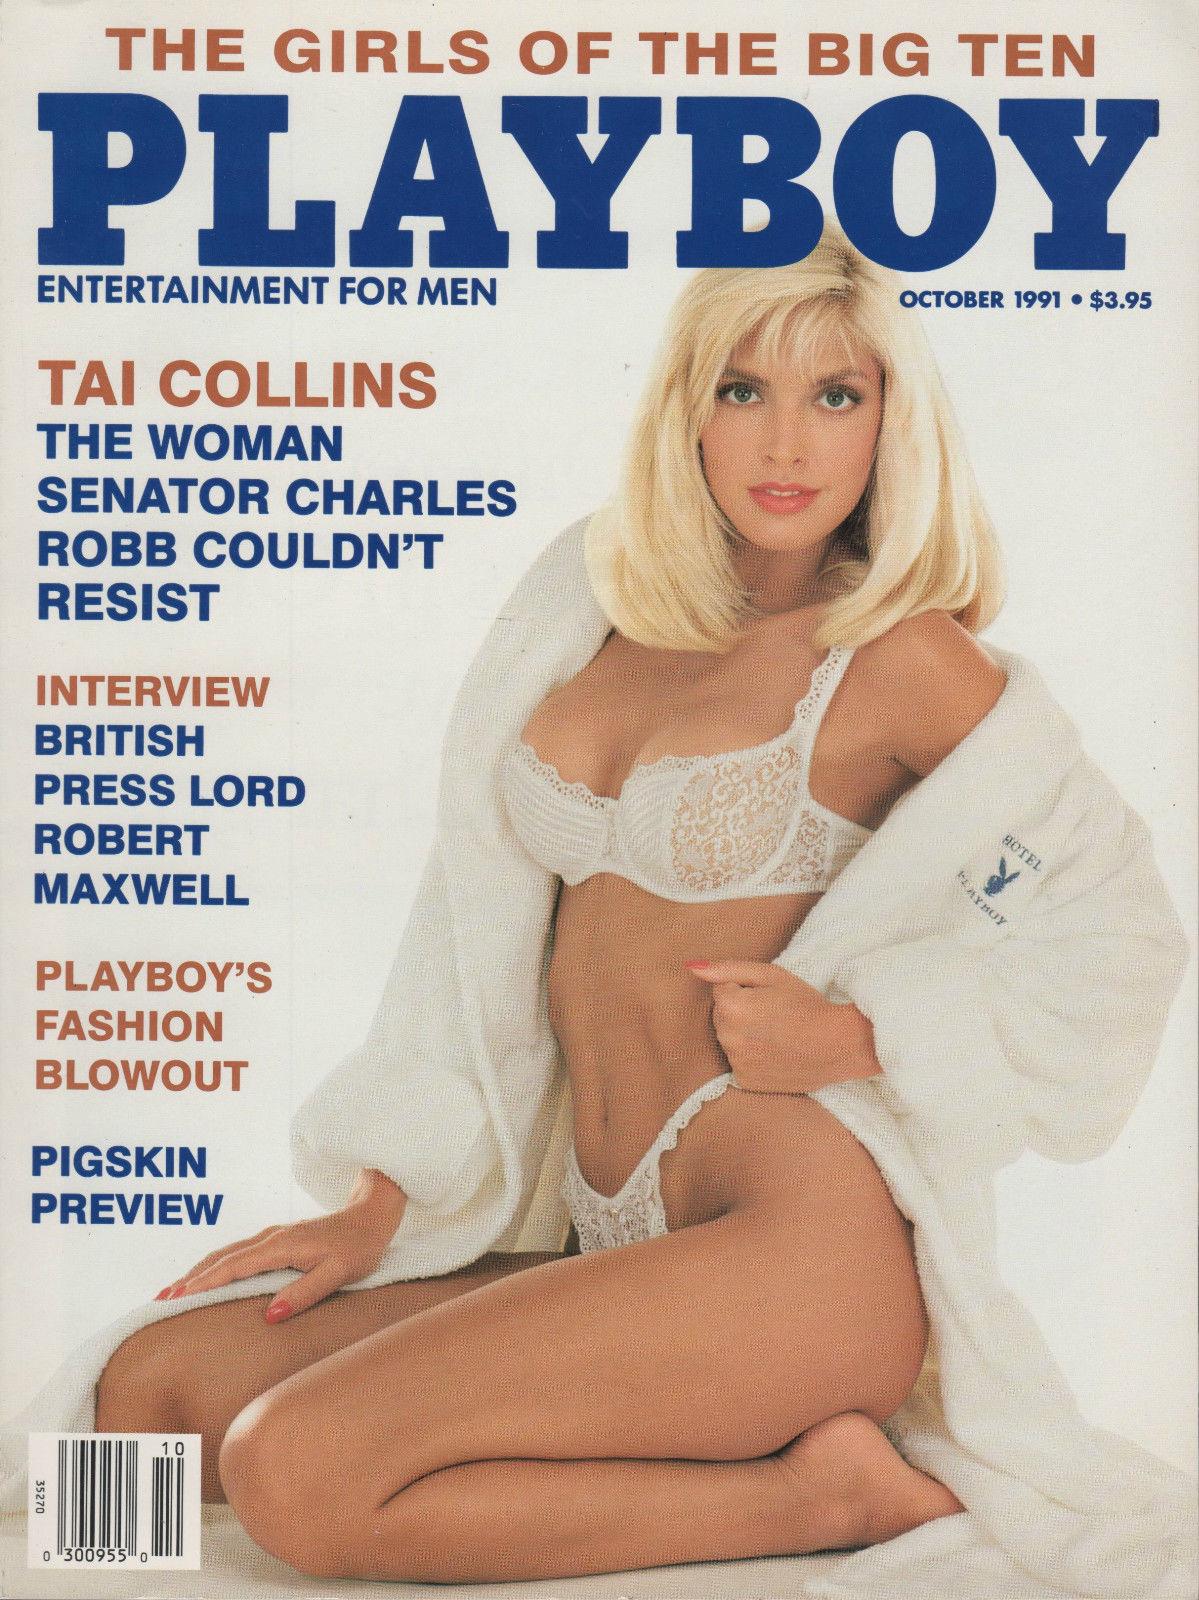 Les nombres en images. Playboy-October1991-cover